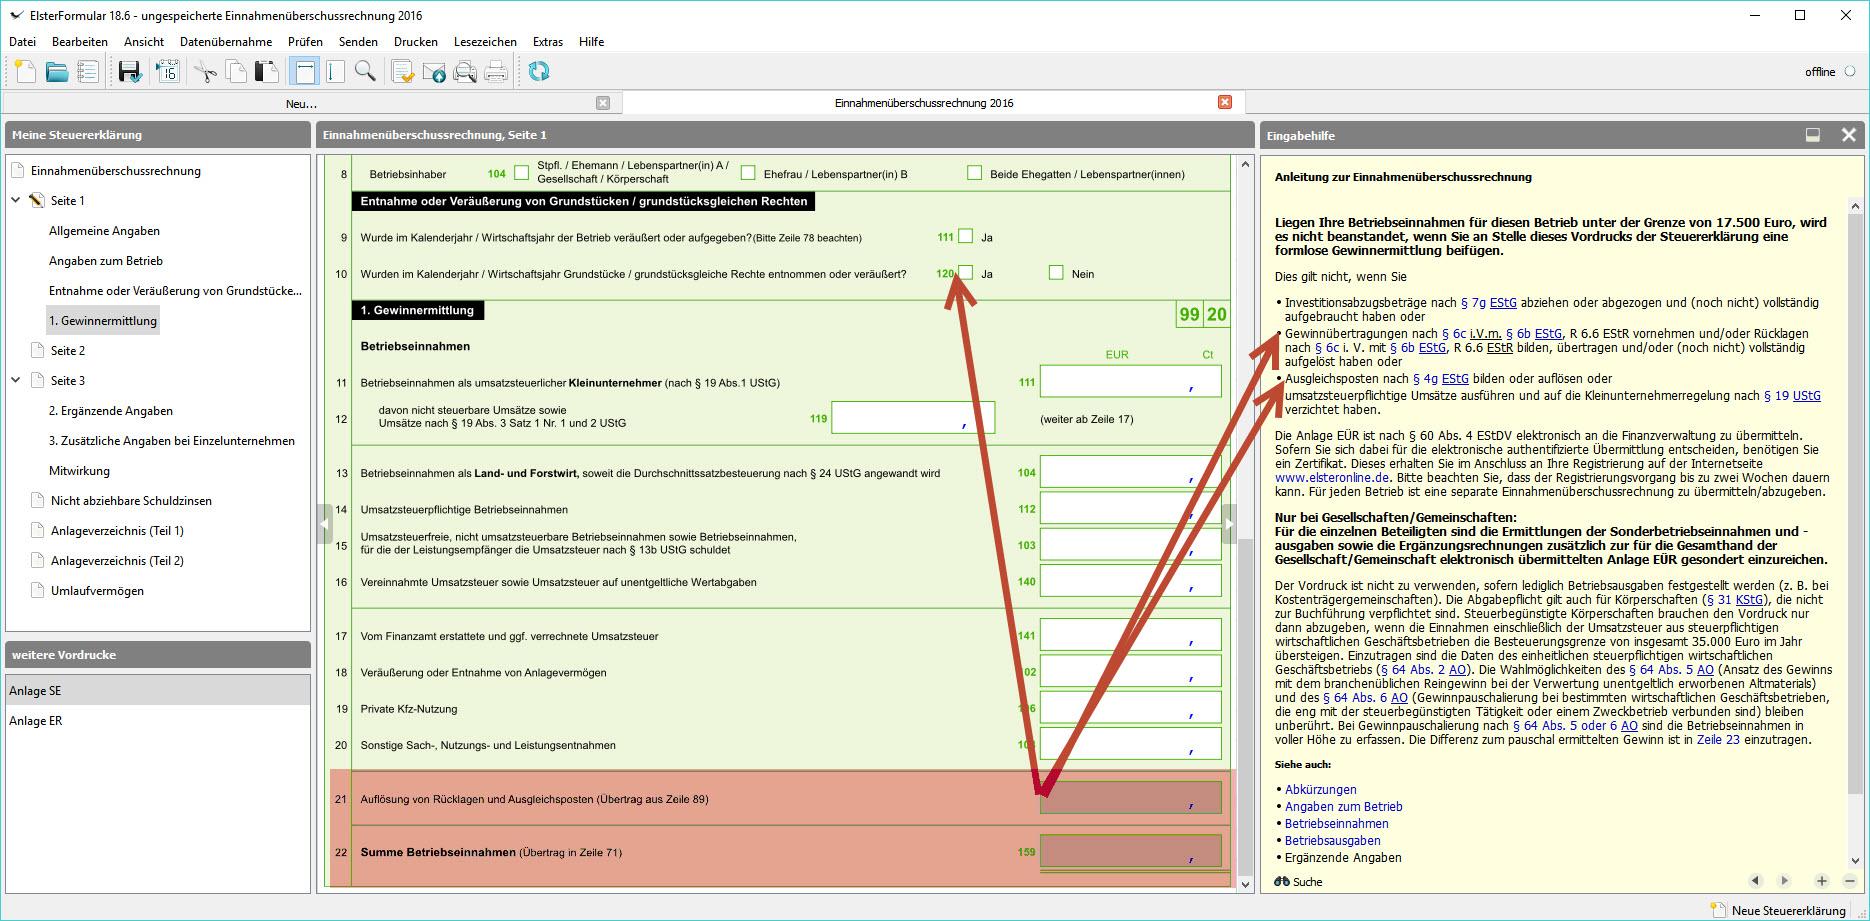 Bundesfinanzministerium formulare 2014 - Amtliche afa tabelle 2016 ...